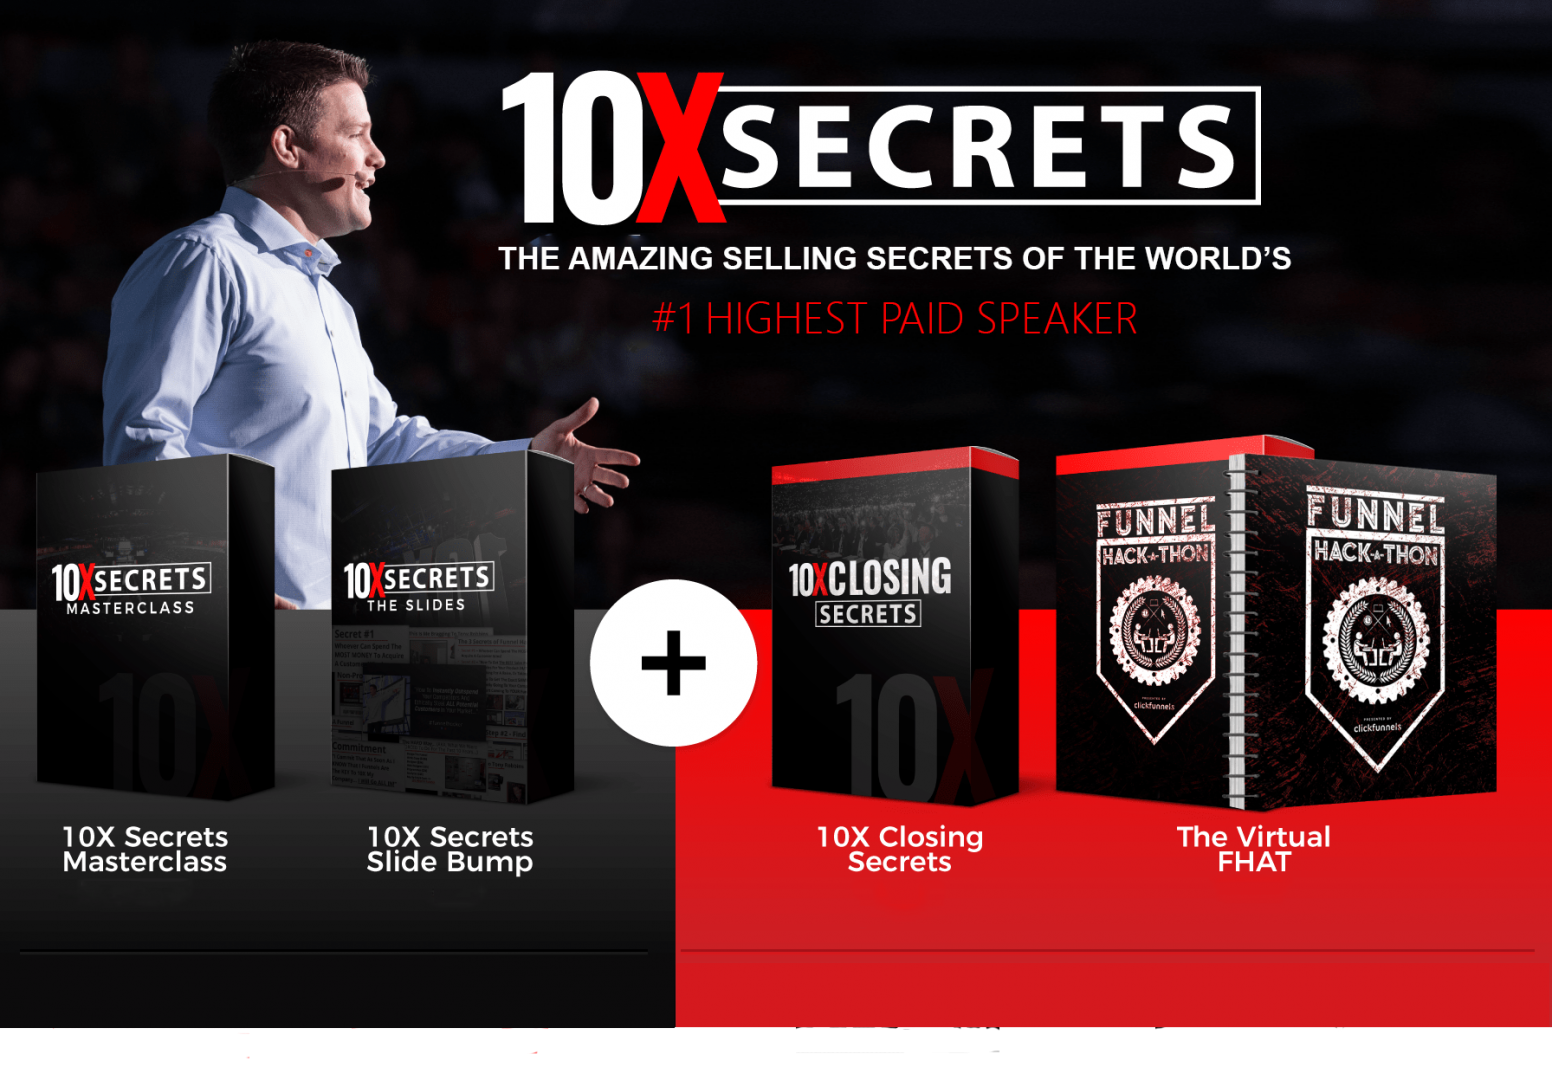 Russell brunson 10x secrets cover